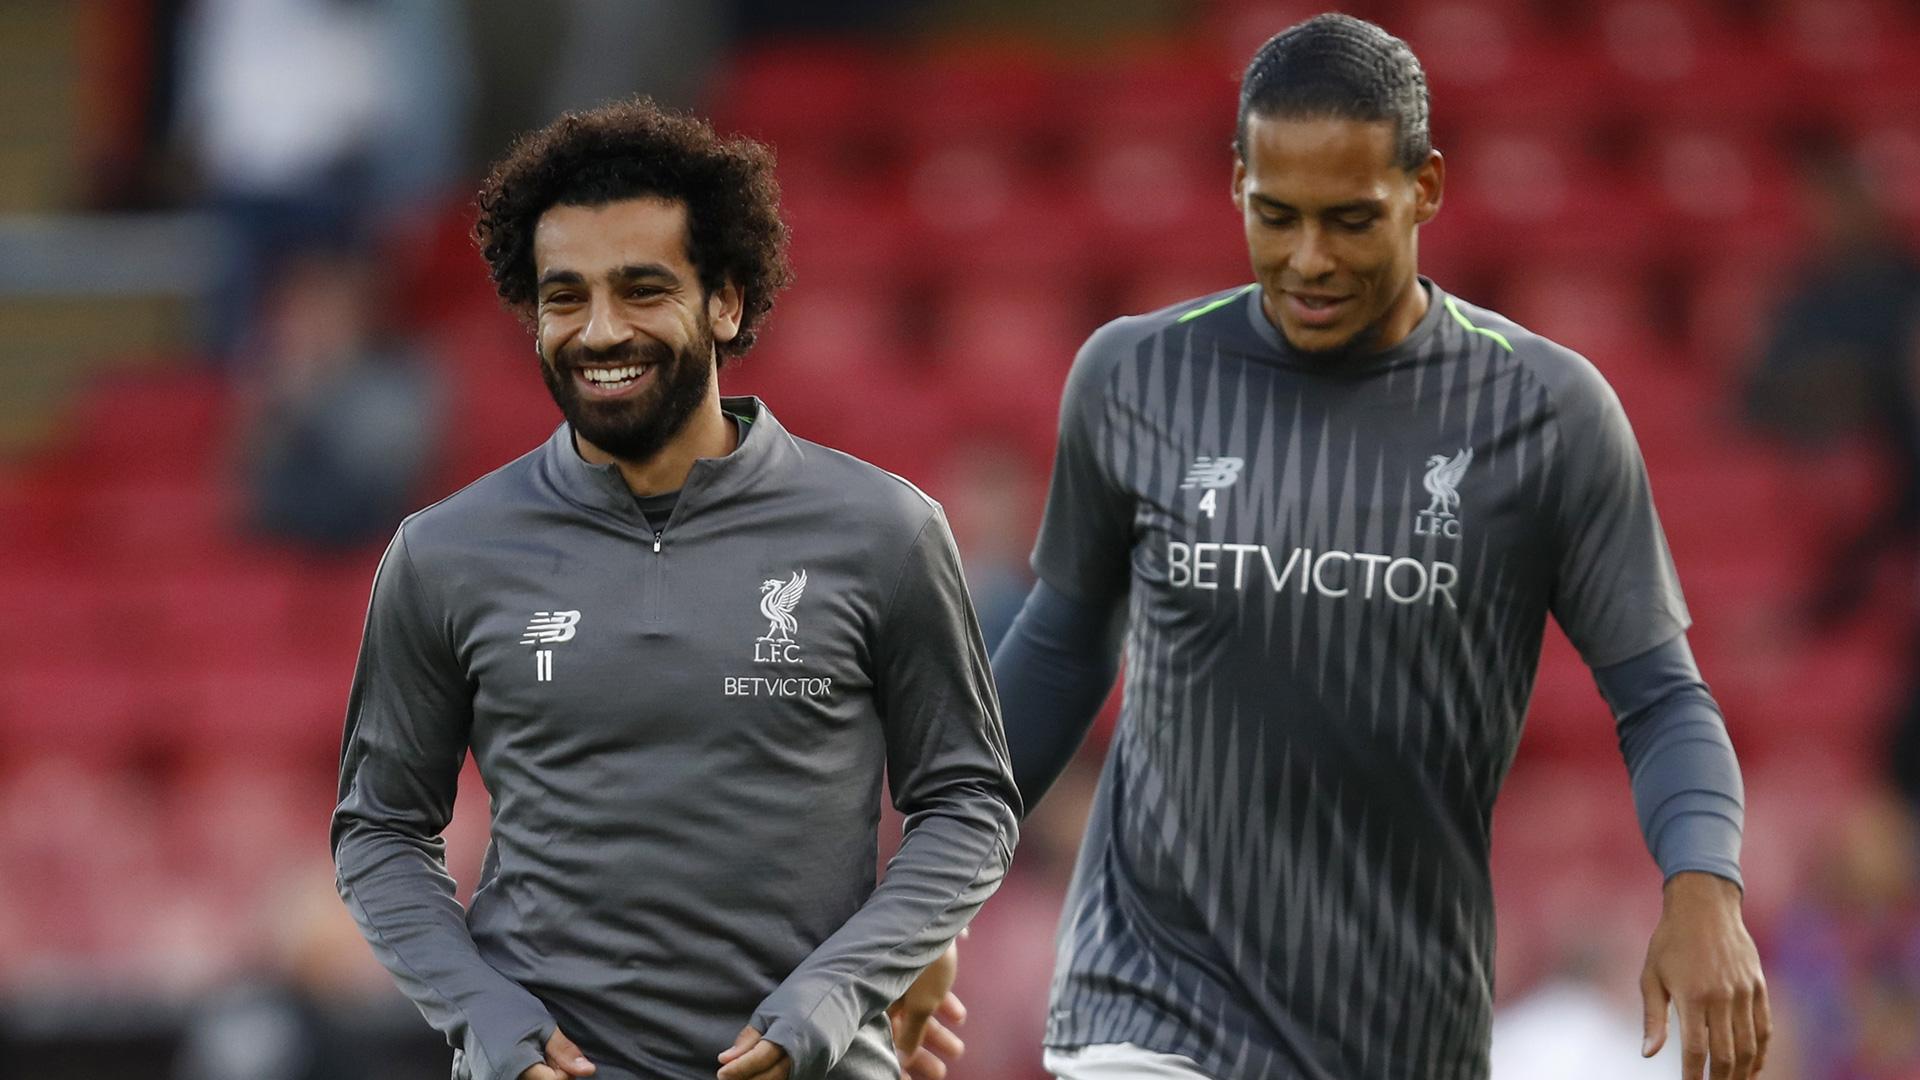 Mohamed-Salah-Virgil-Van-Dijk